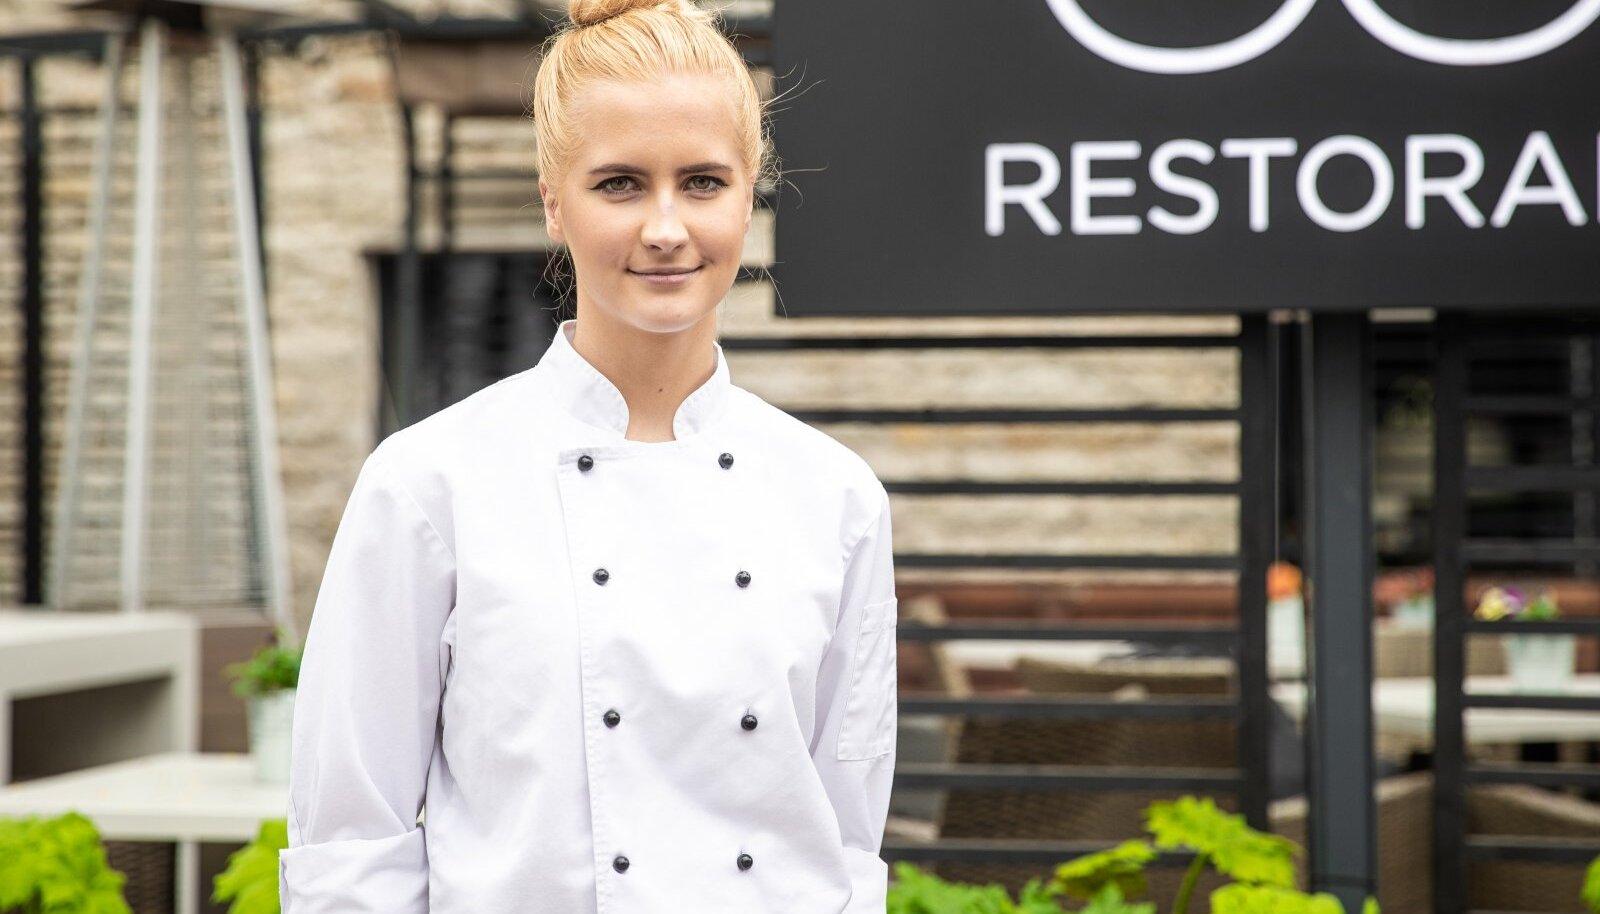 Carina-Elisabeth Hade, Restoran Platz